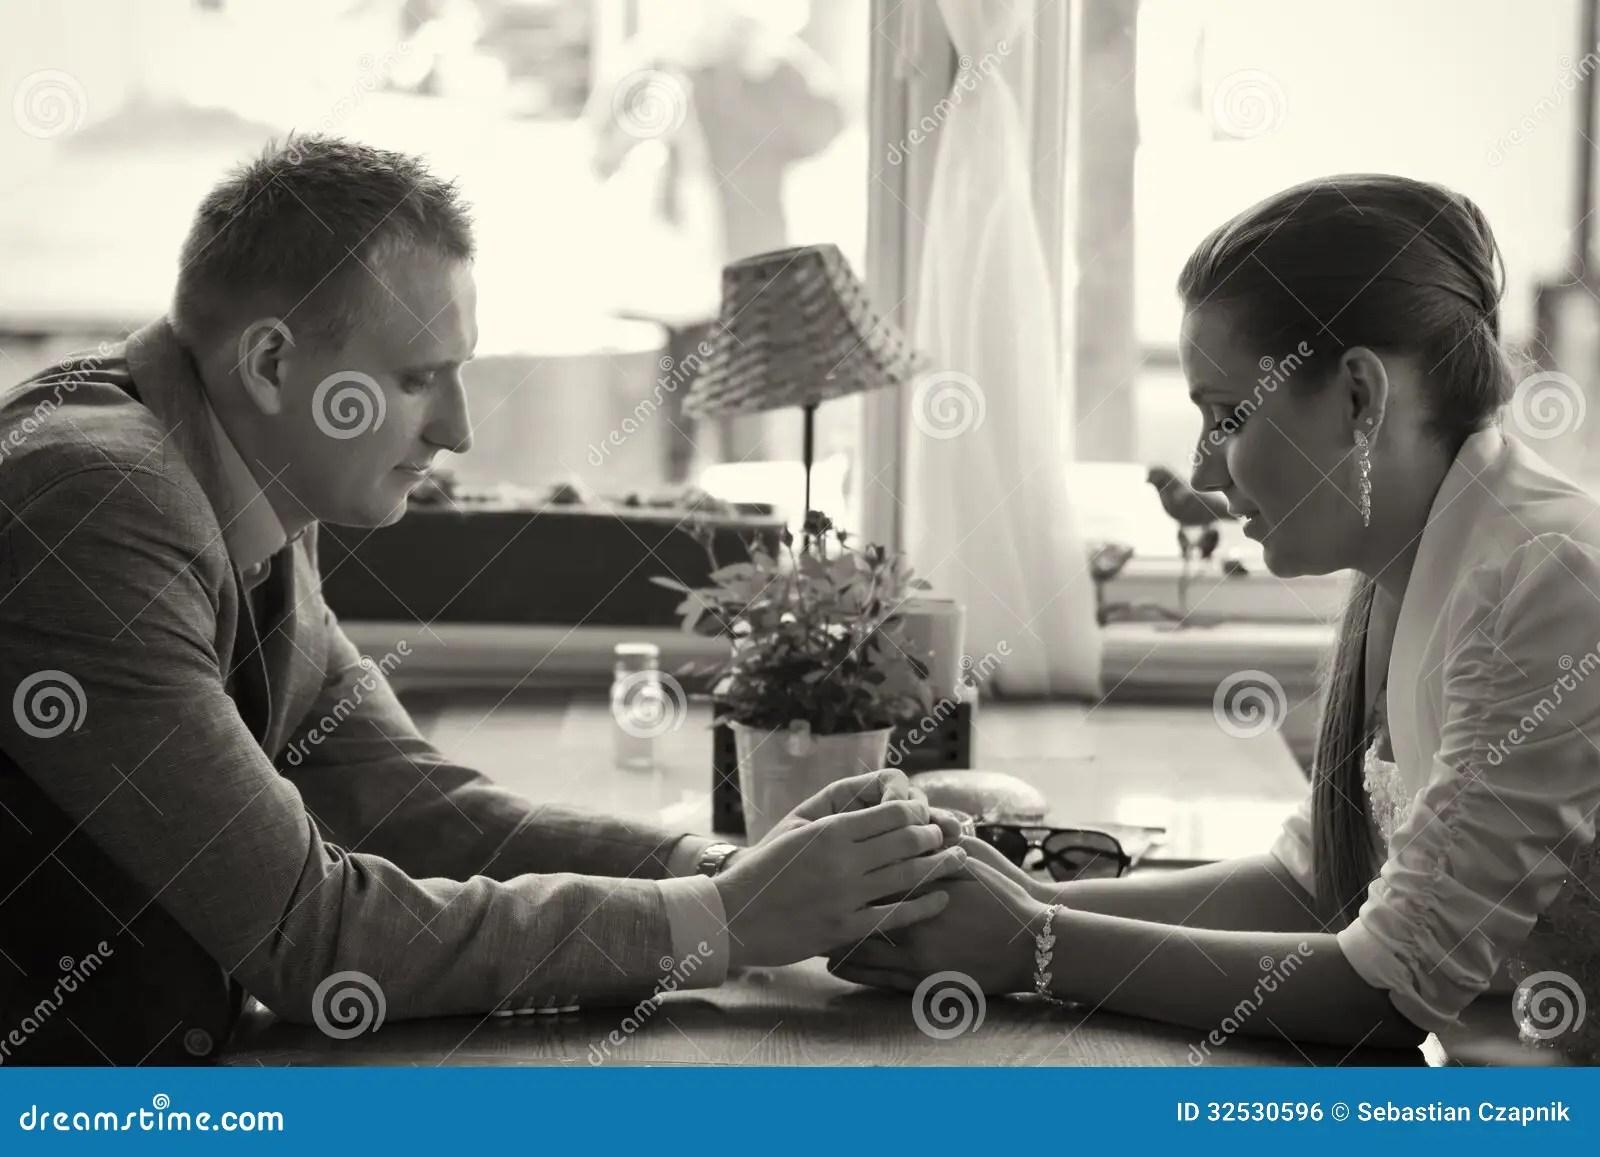 Couple Having Conversation Stock Photo Image Of People